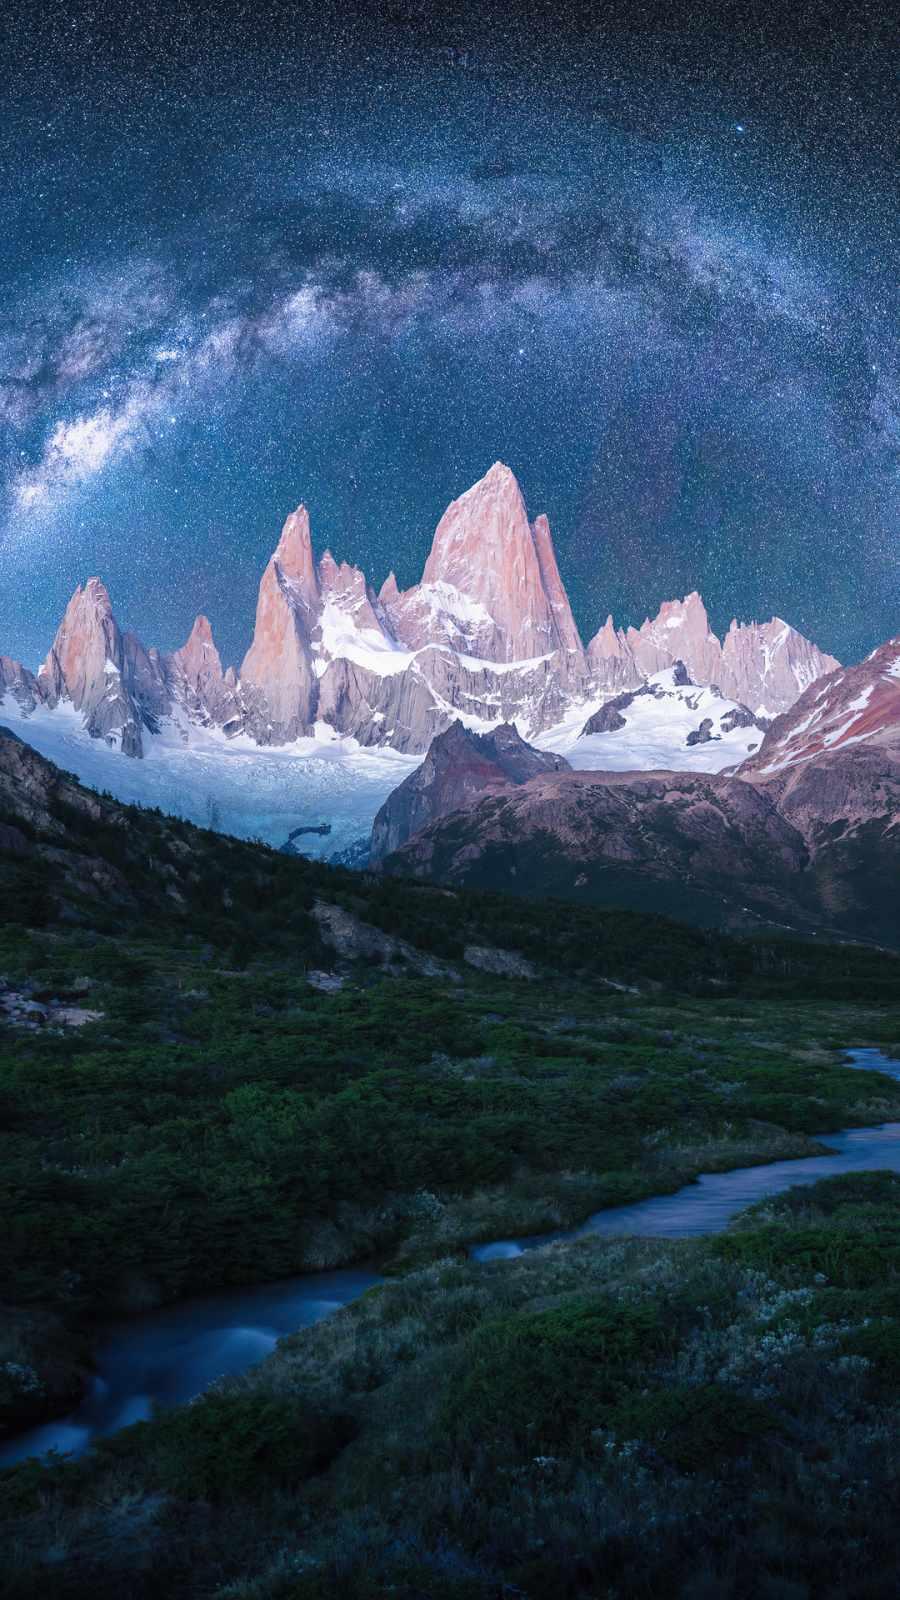 mountains snow stars galaxy